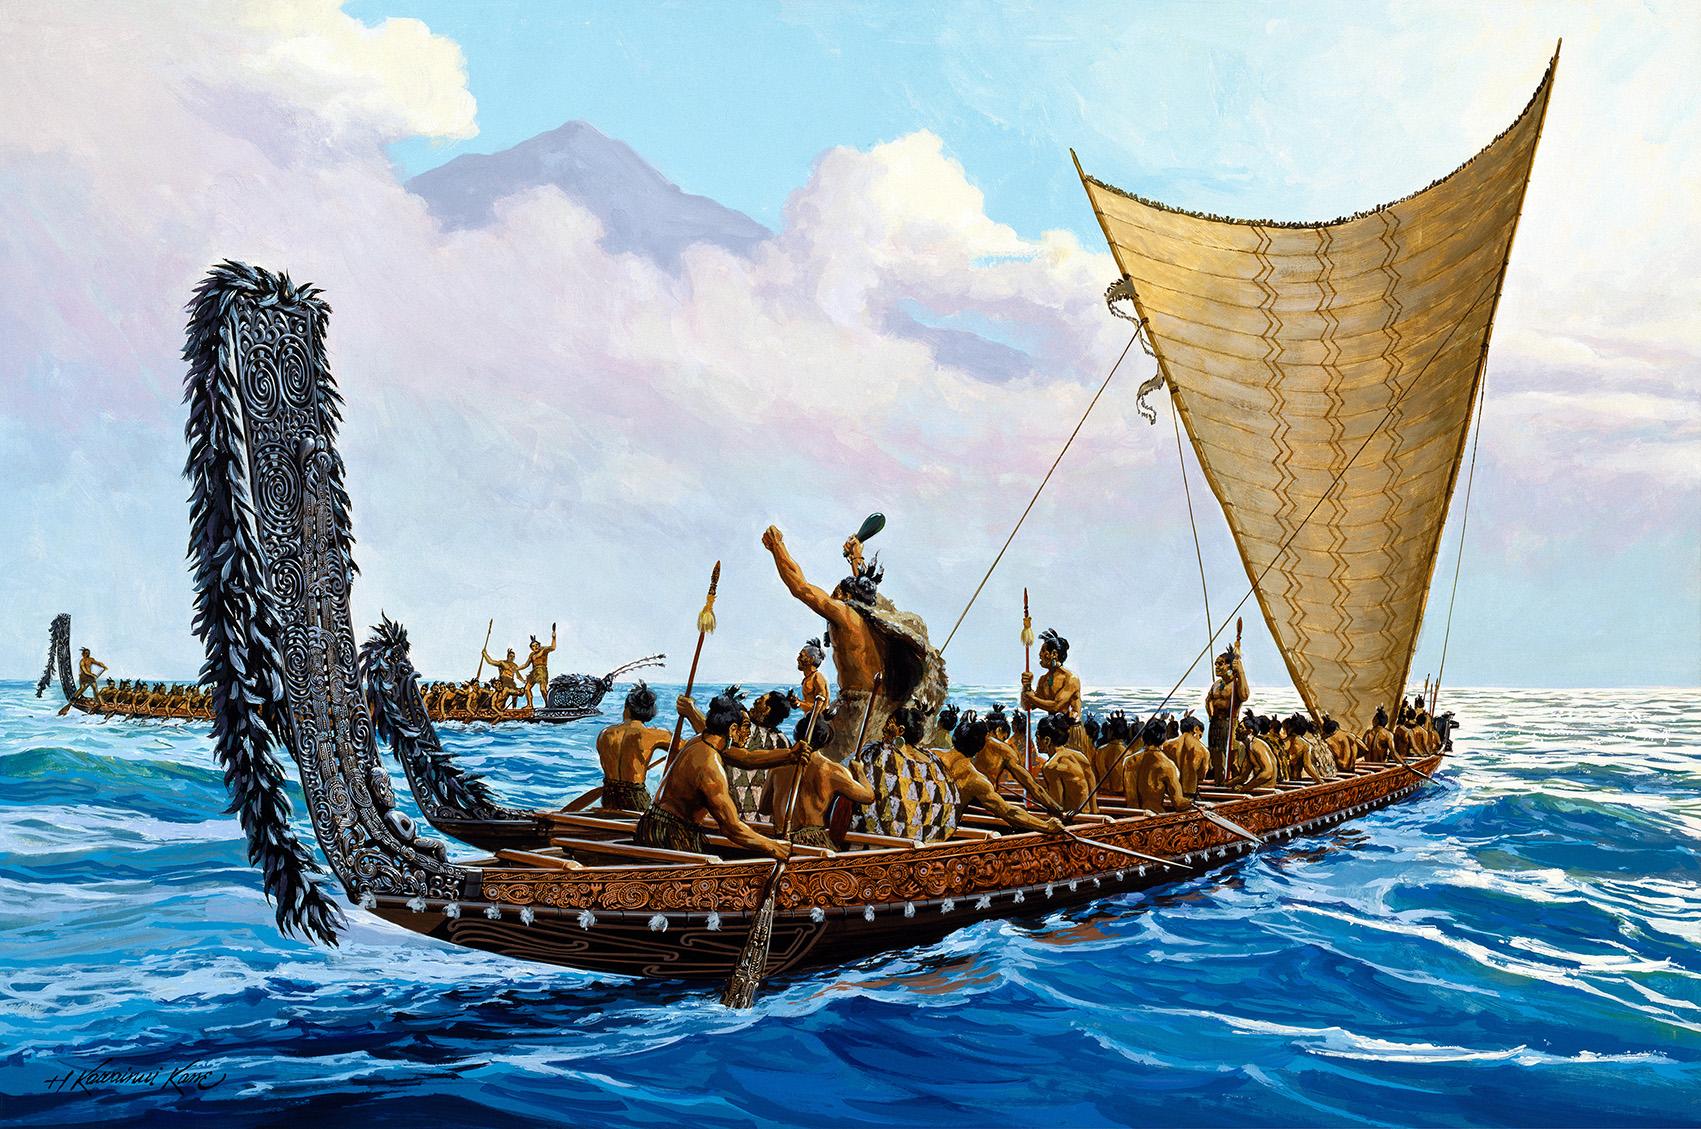 Herb Kane_War Canoes of the New Zealand Maori - 10 Inch ORIGINAL_WEB.jpg